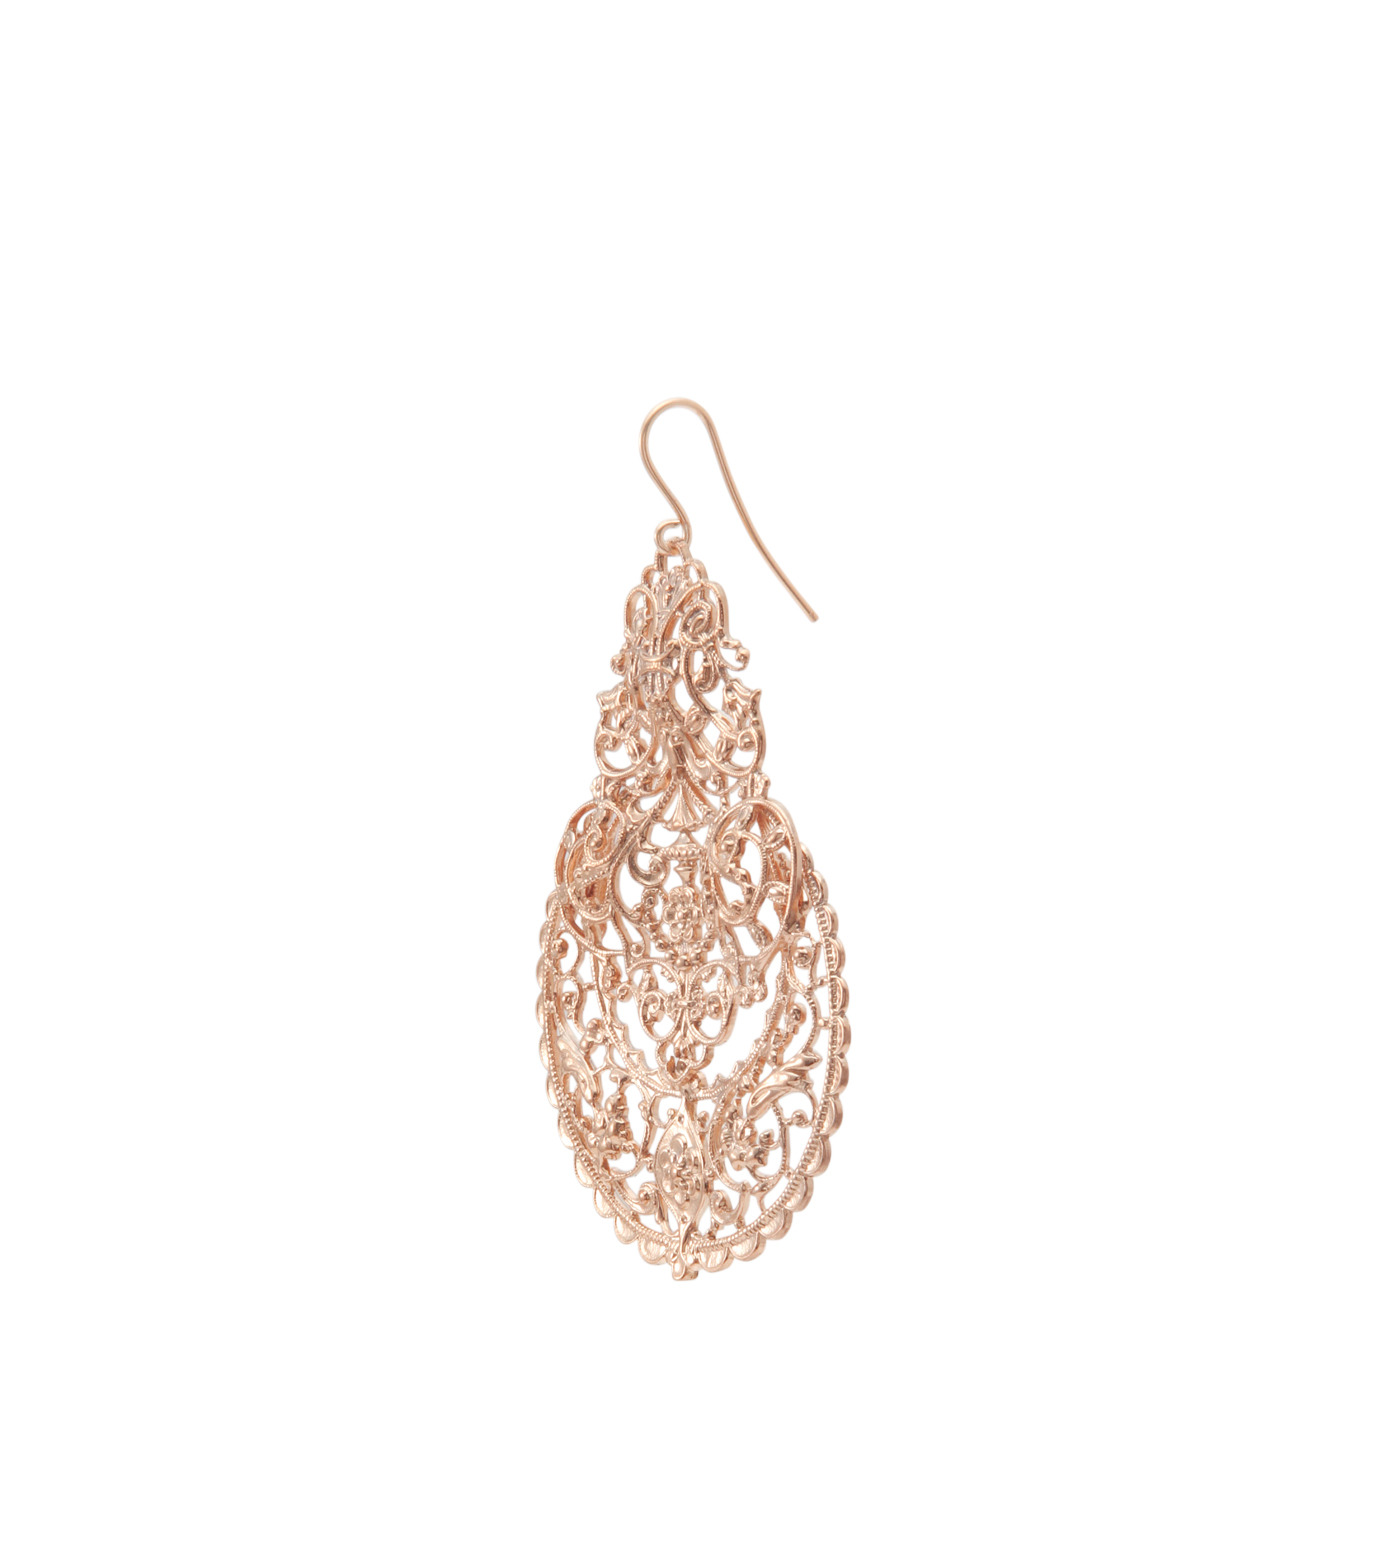 I AM by Ileana Makri(アイ アム バイ イリーナ マクリ)のAntoinette Earrings-ROSE-O489-43-099-75 拡大詳細画像2